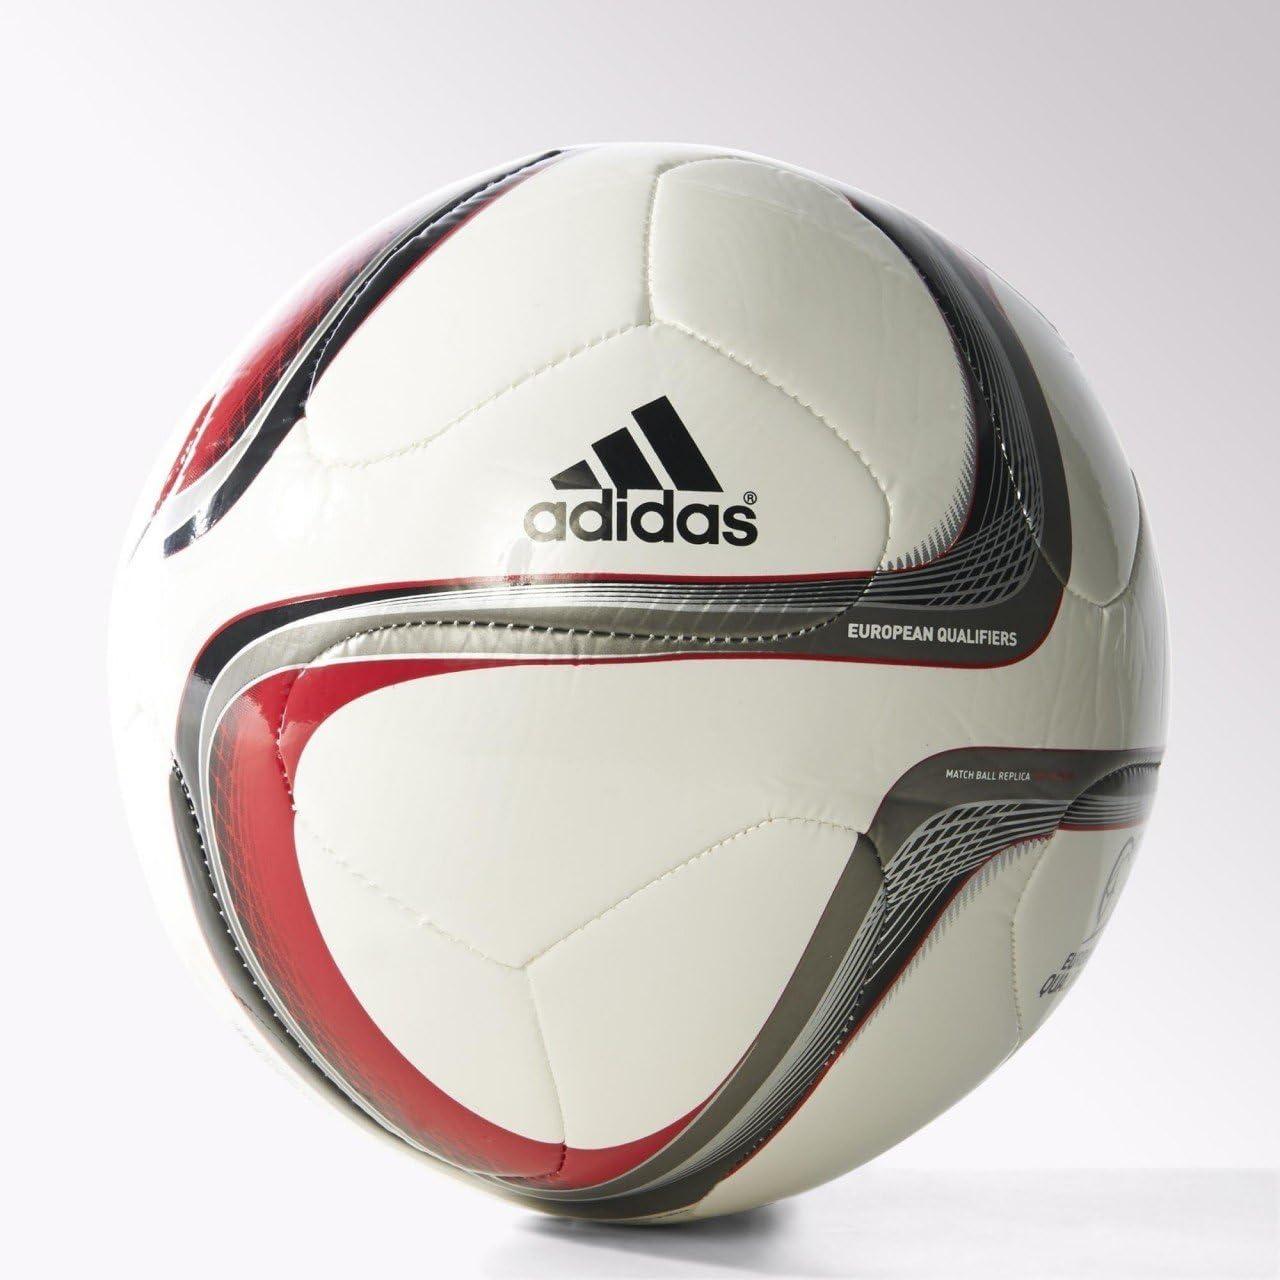 adidas - Balón de fútbol Euro Qualifier Top Glider: Amazon.es ...